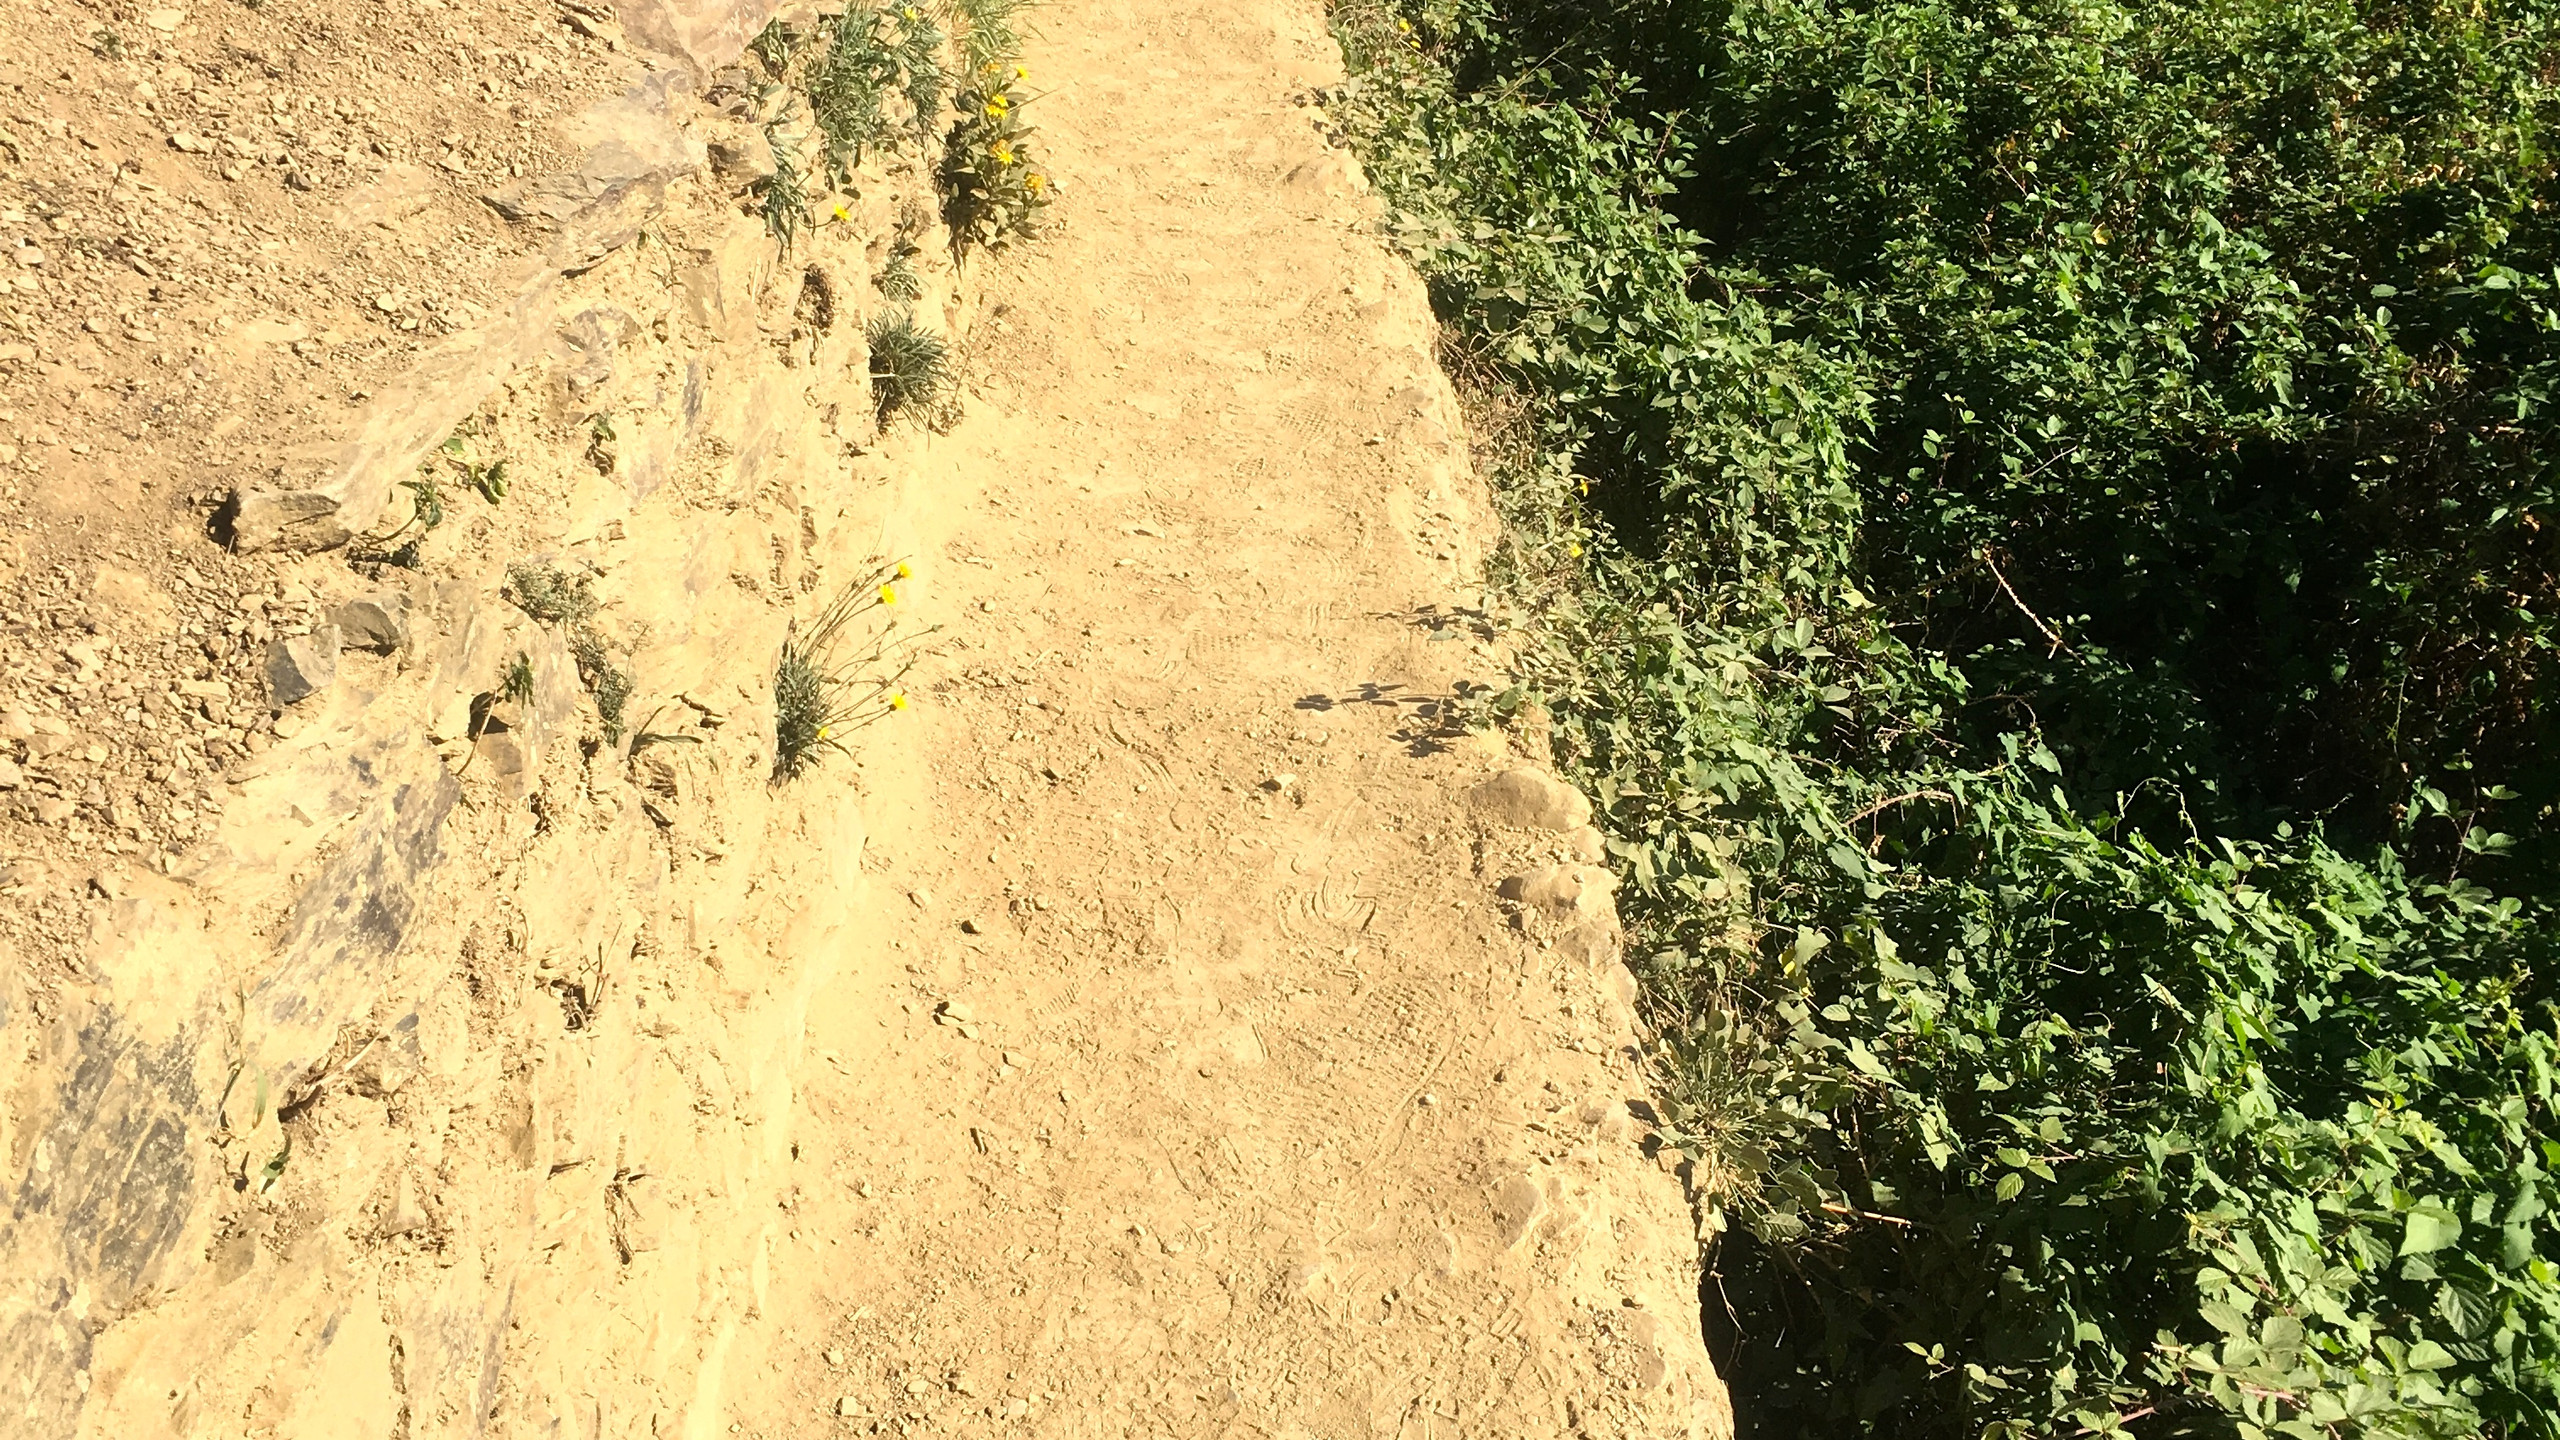 The narrow path with no rail!